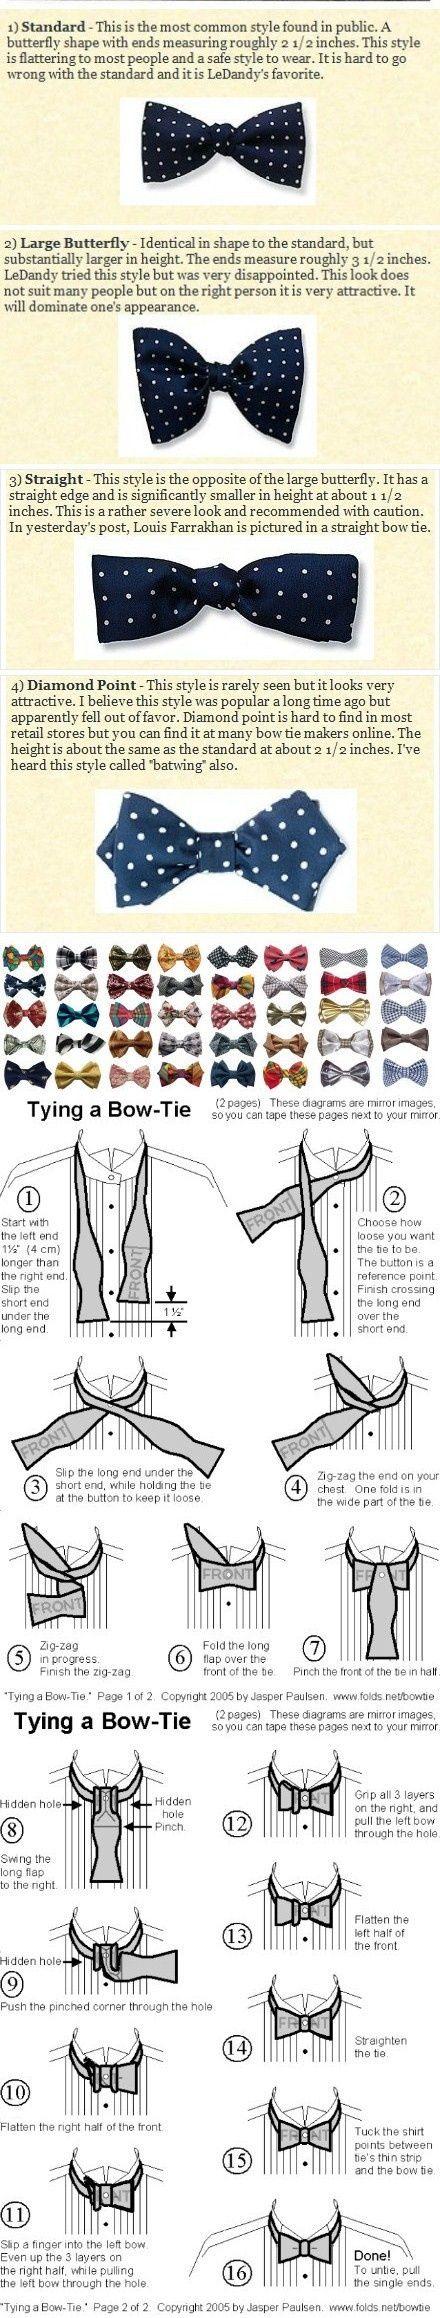 Bowties & how to tie em